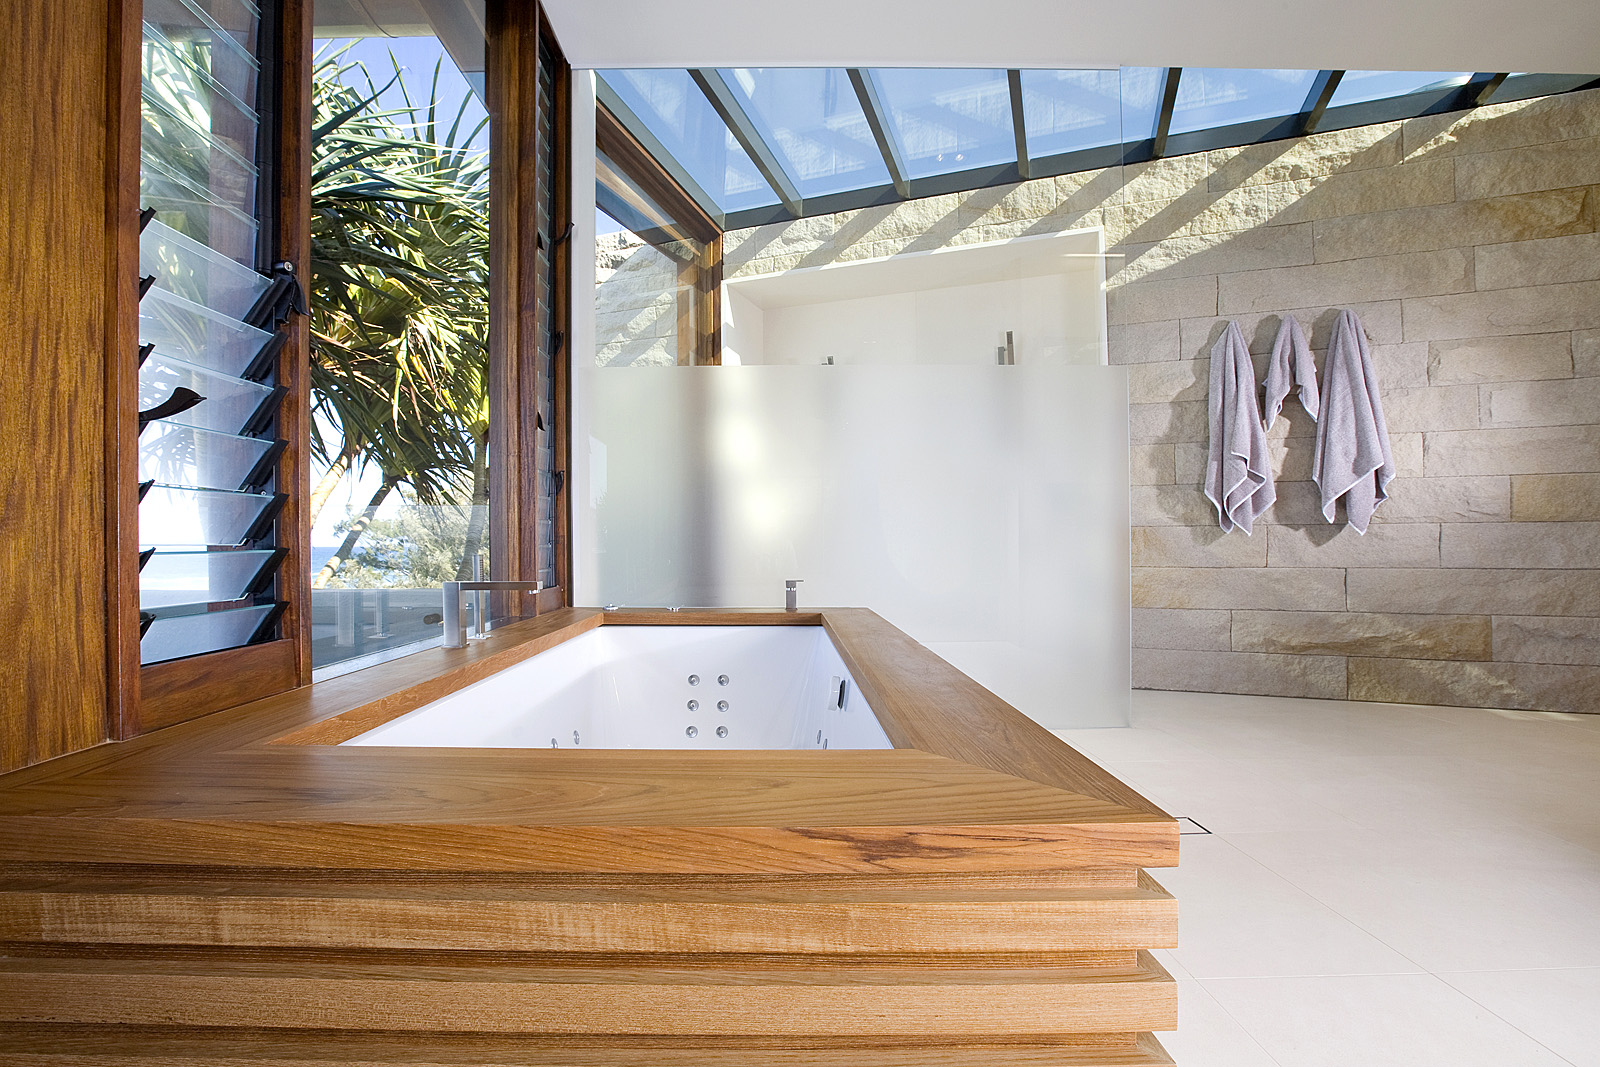 Bathroom luxury: Split faced, sandstone wall